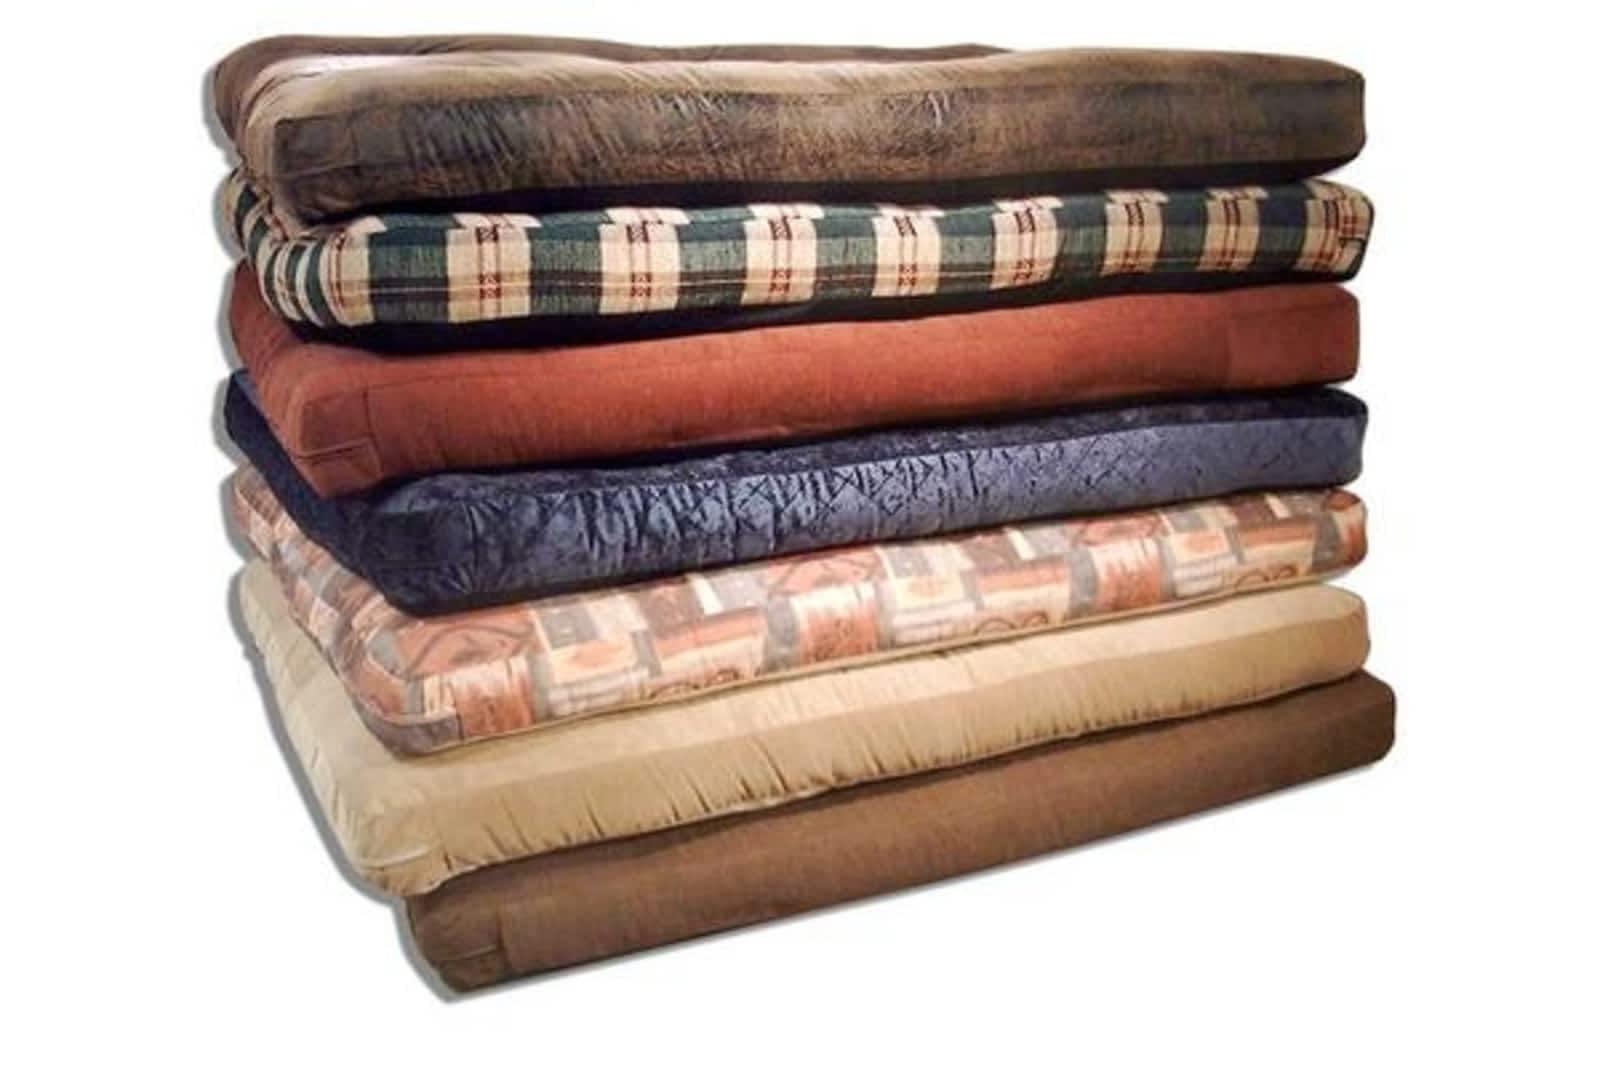 mattress plaza - opening hours - 4-1391 st james st, winnipeg, mb